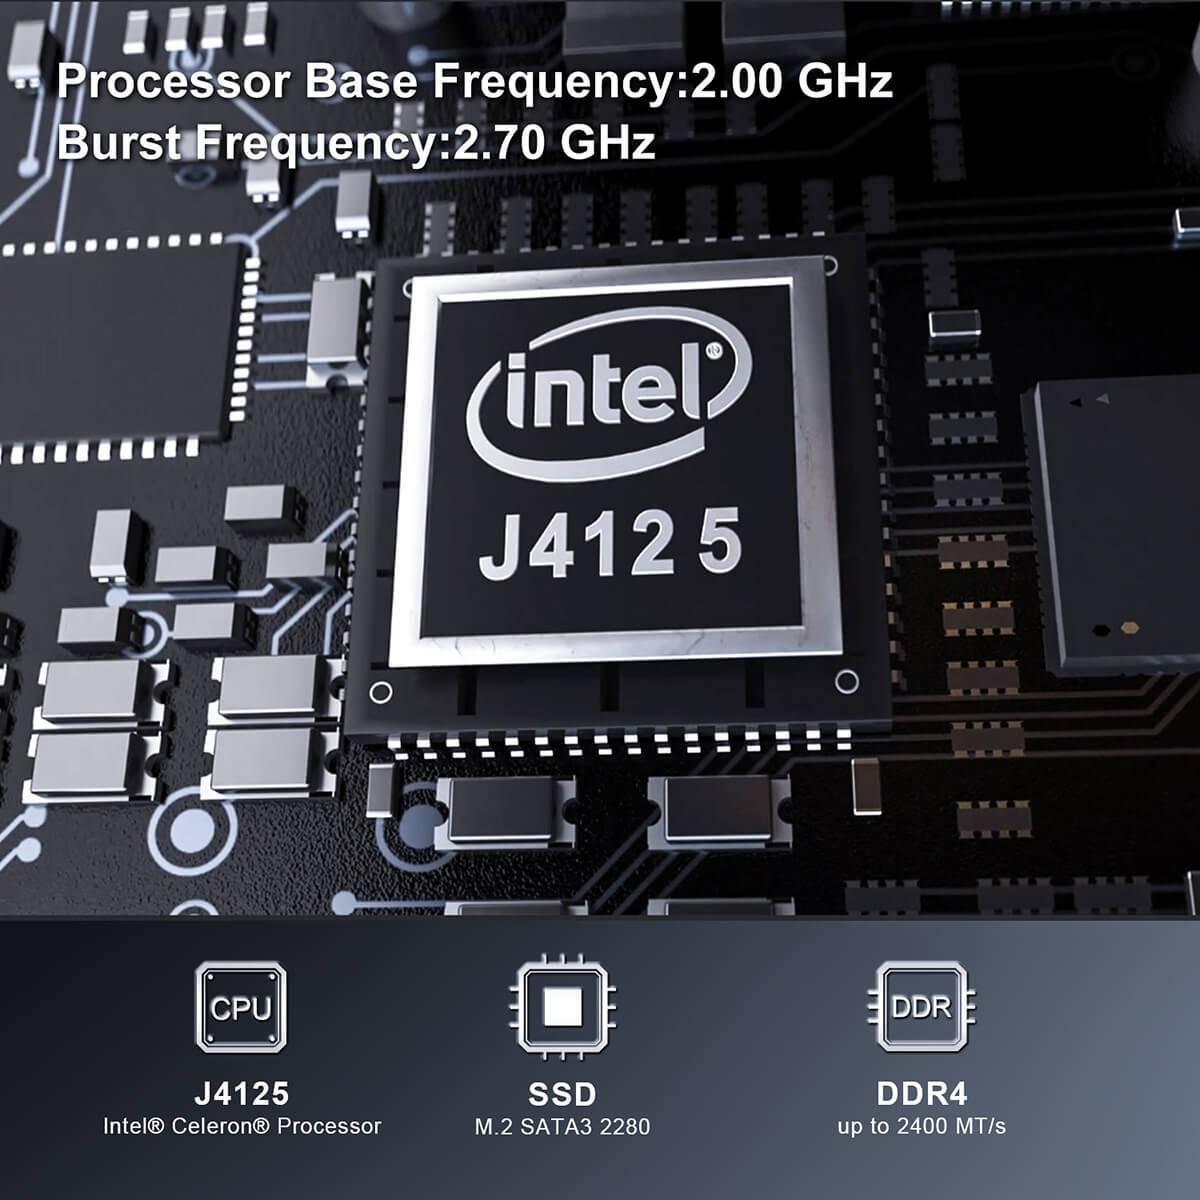 Beelink GK Mini Intel NUC Windows PC showing Intel Celeron J4125 Processor